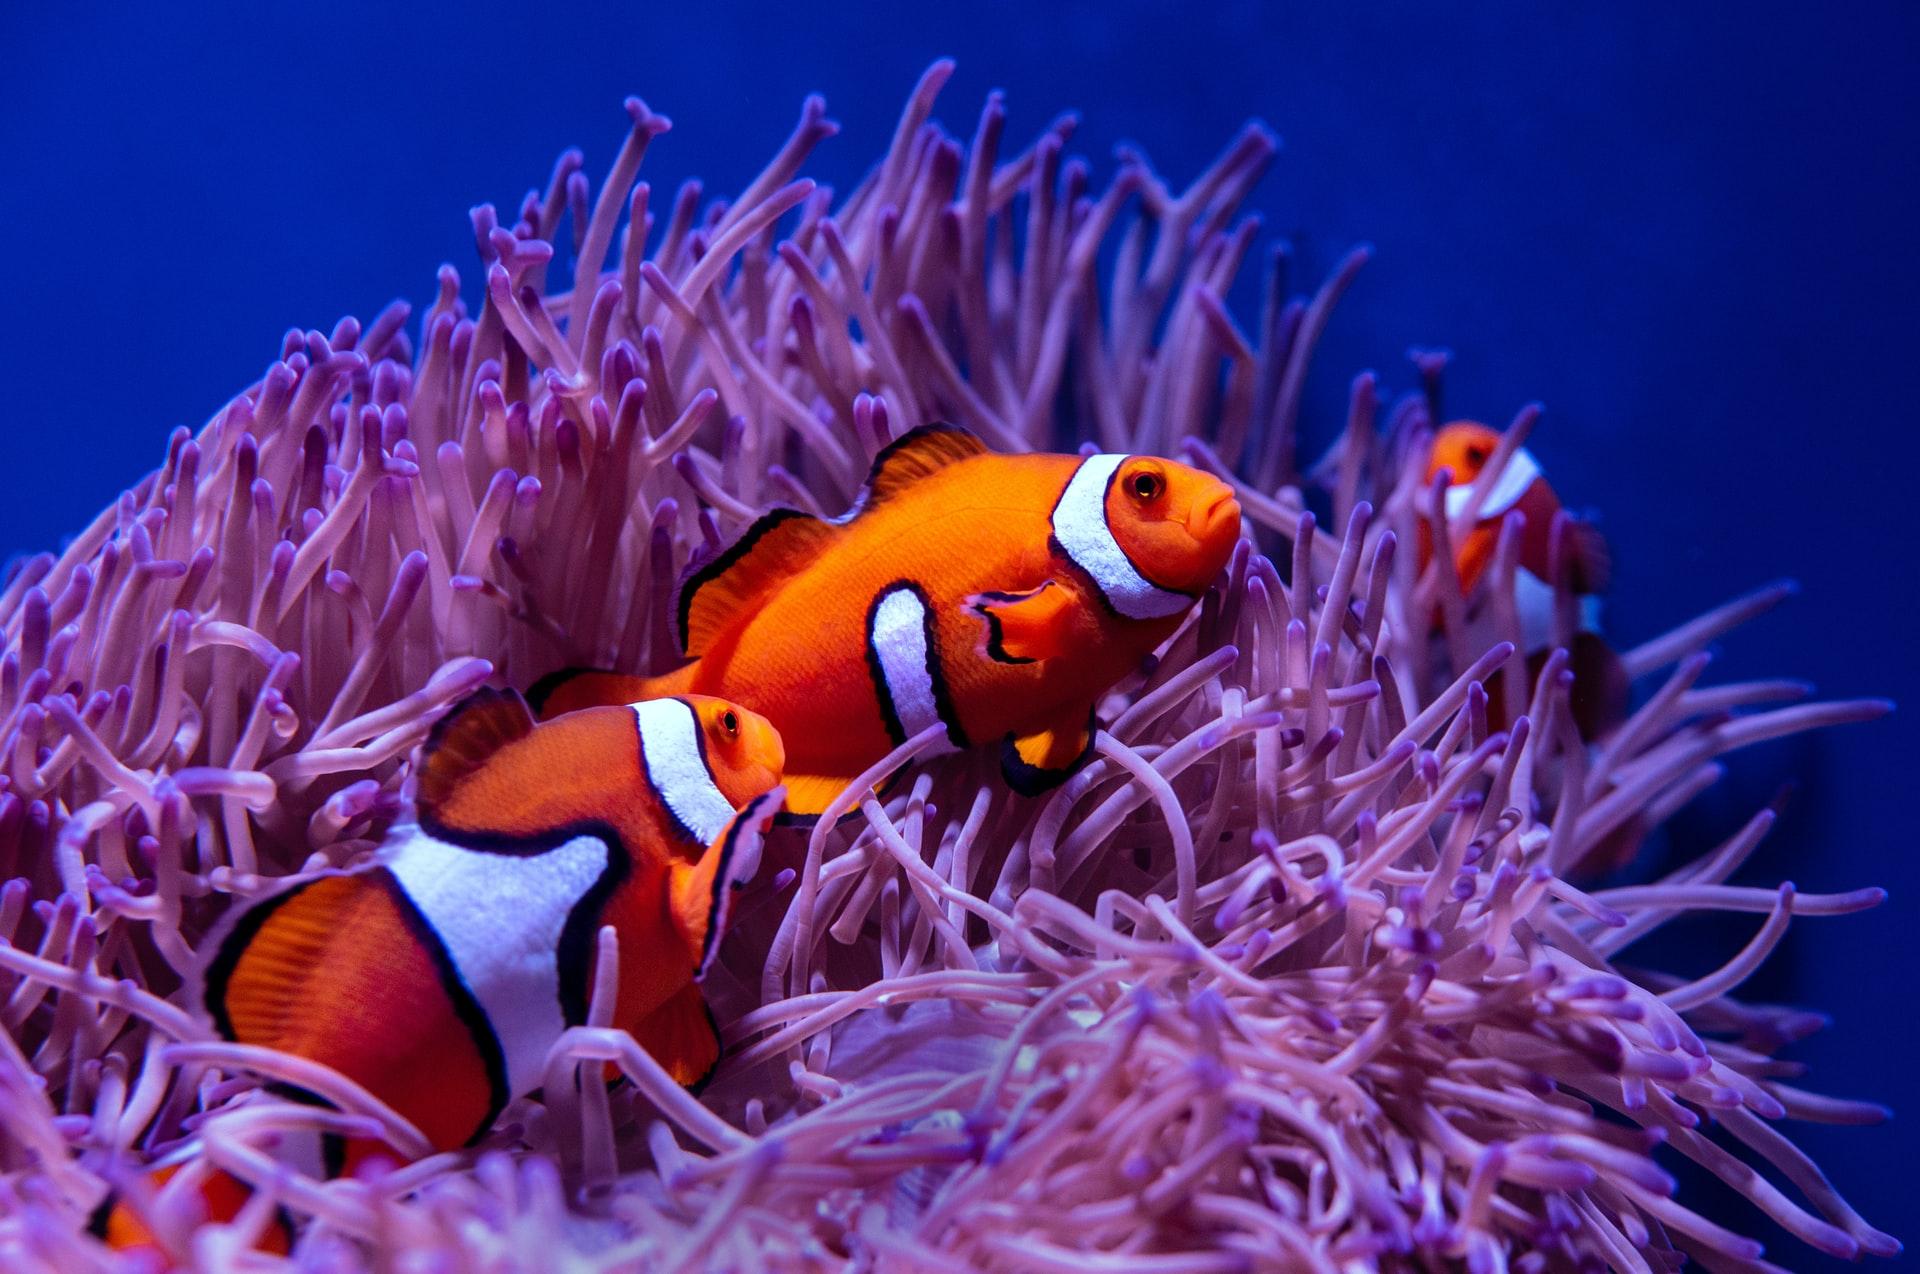 Smart solutions restoring coral reefs